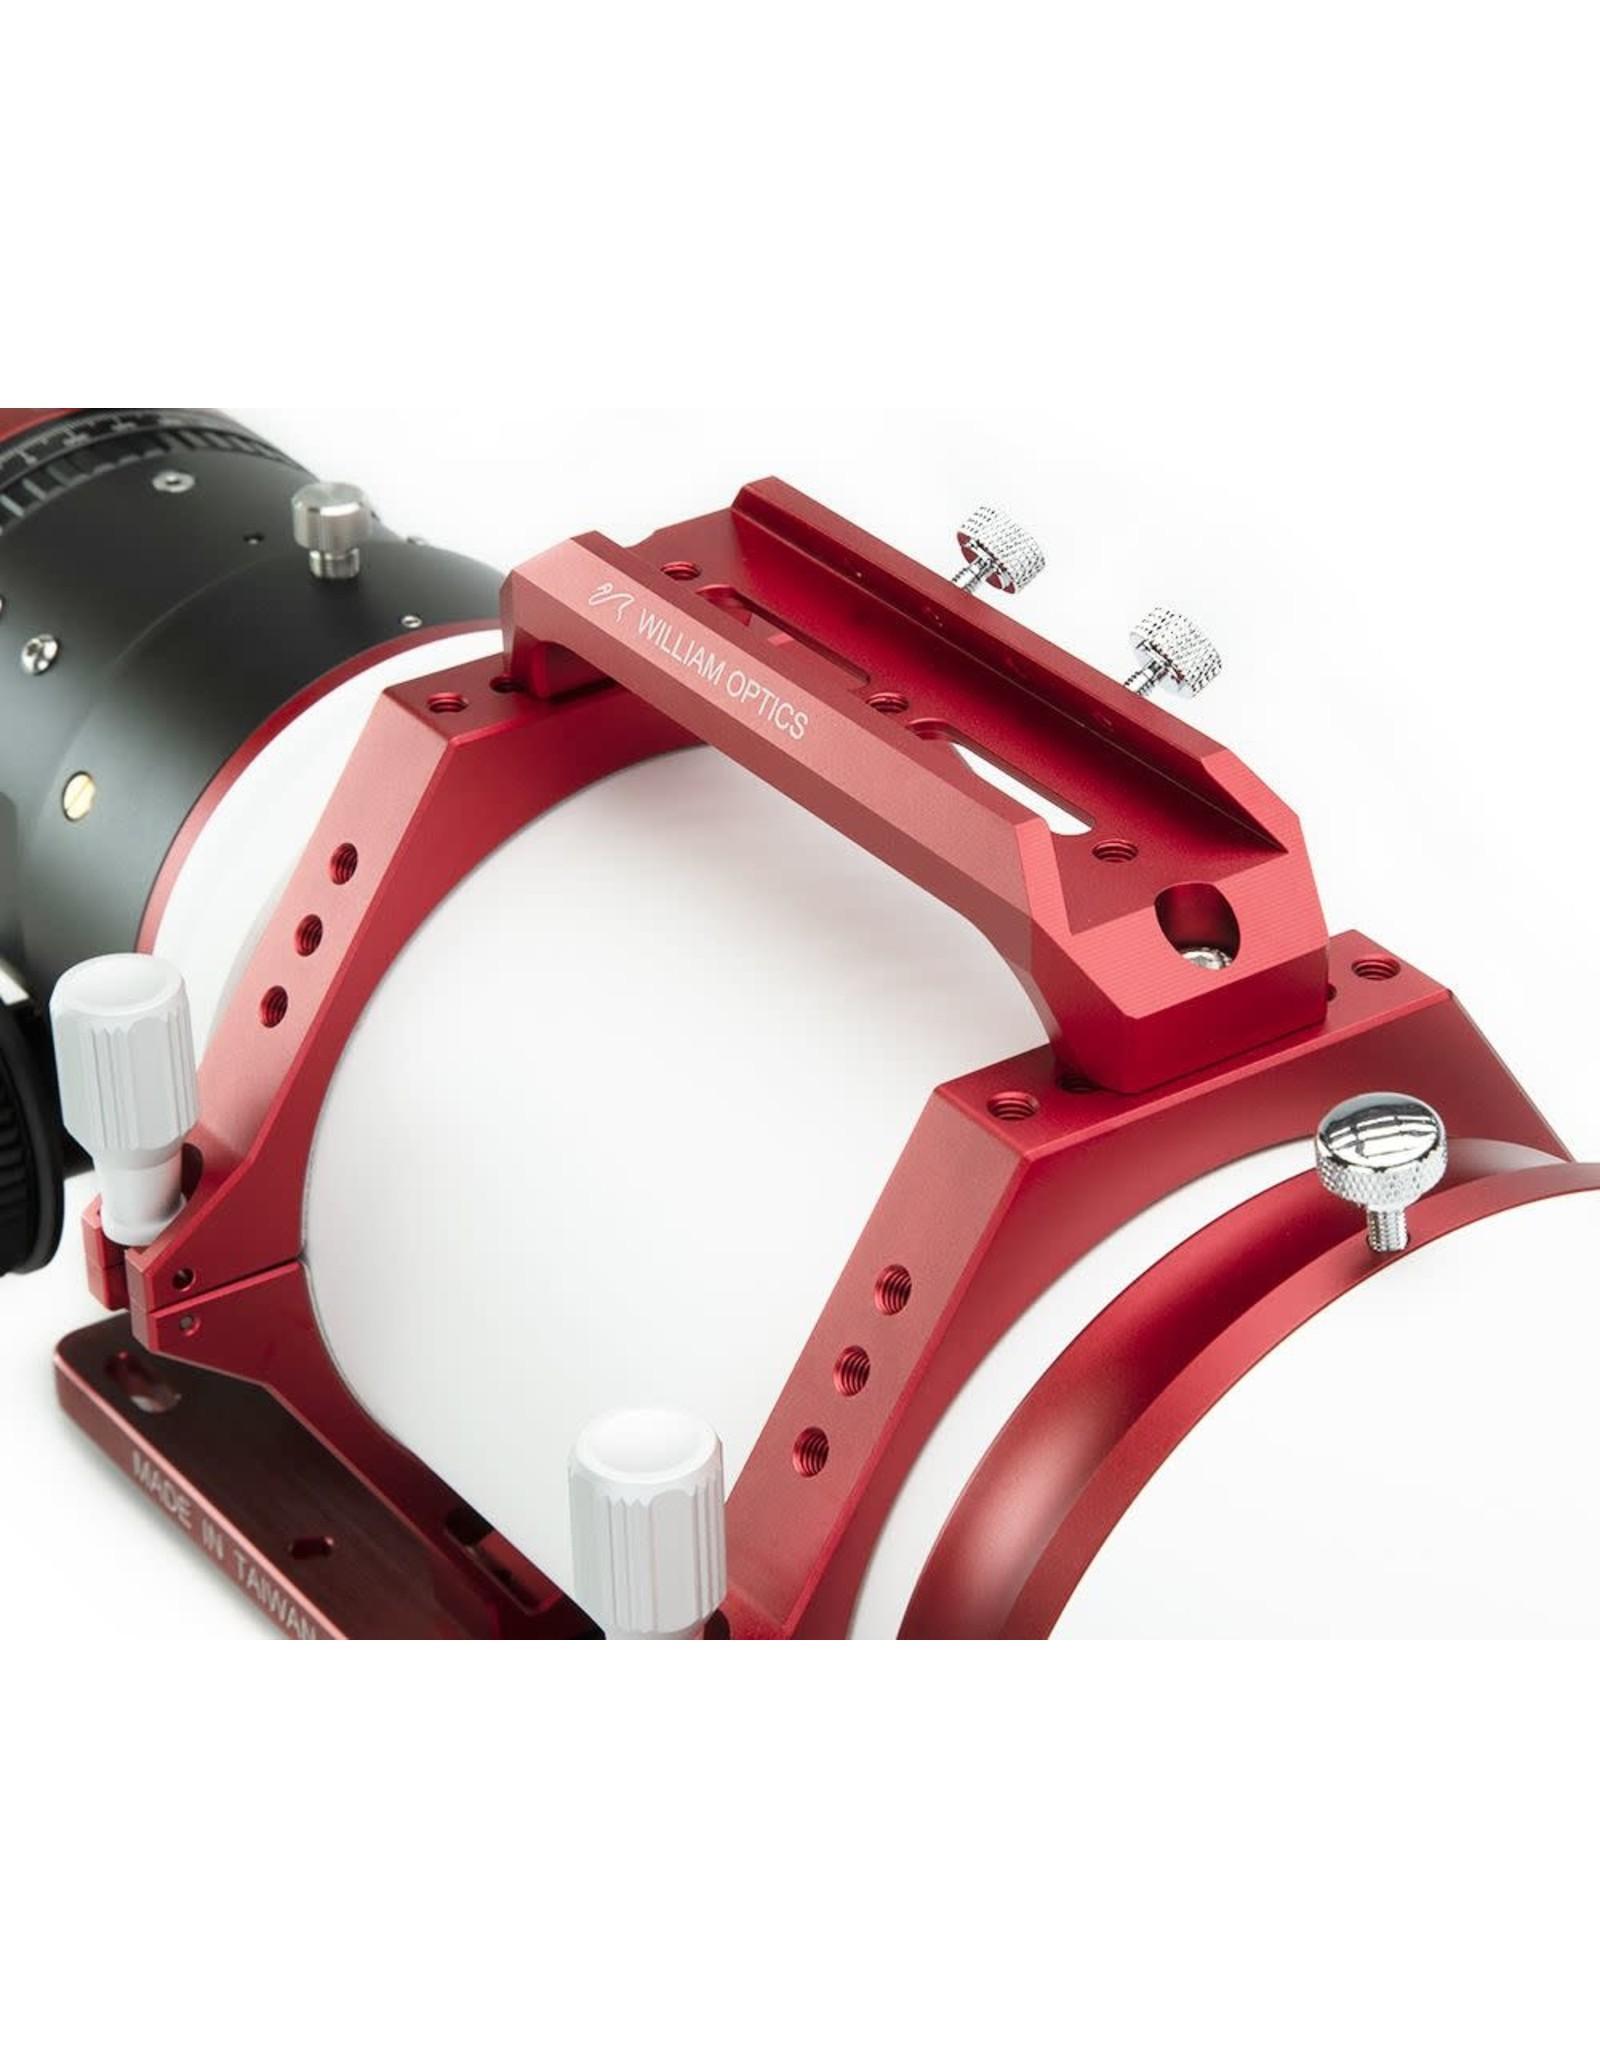 William Optics William Optics Fluorostar 120mm f6.5 with Innovative Bahtinov Mask Cover (Patented) (Specify Color)